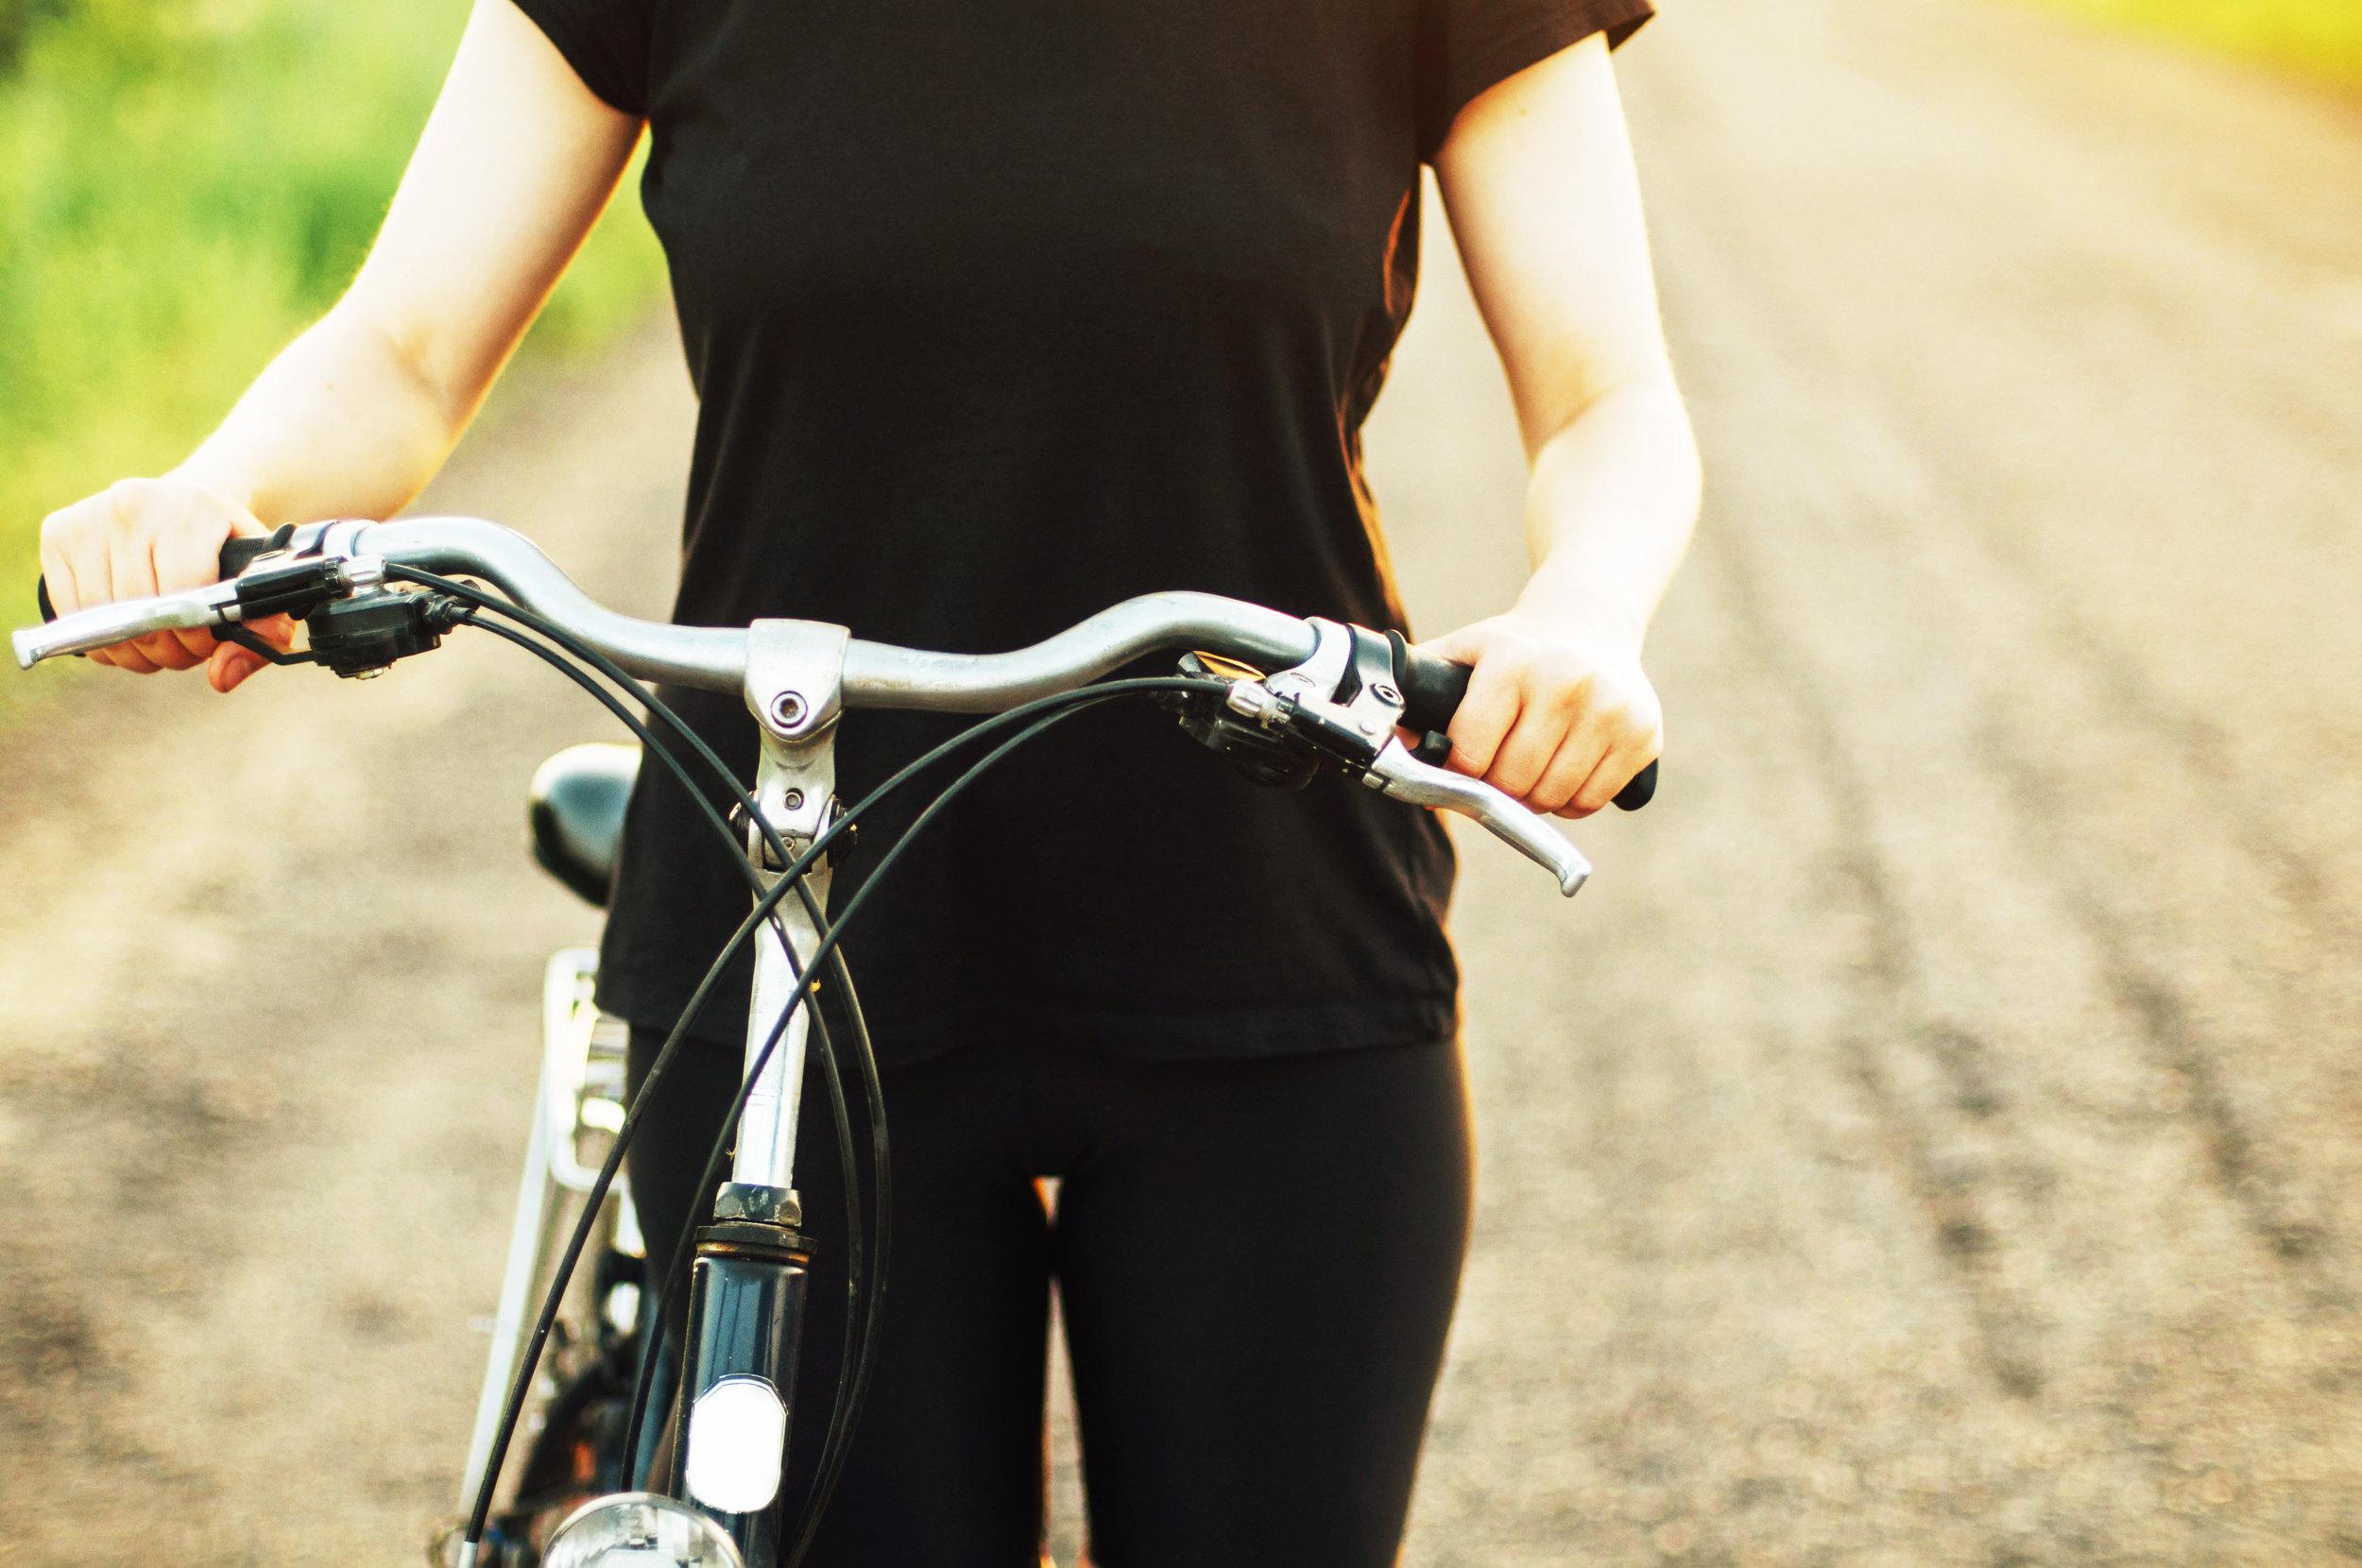 bigstock-Detail-Of-A-Bicycle-Woman-Rid-137602982.jpg